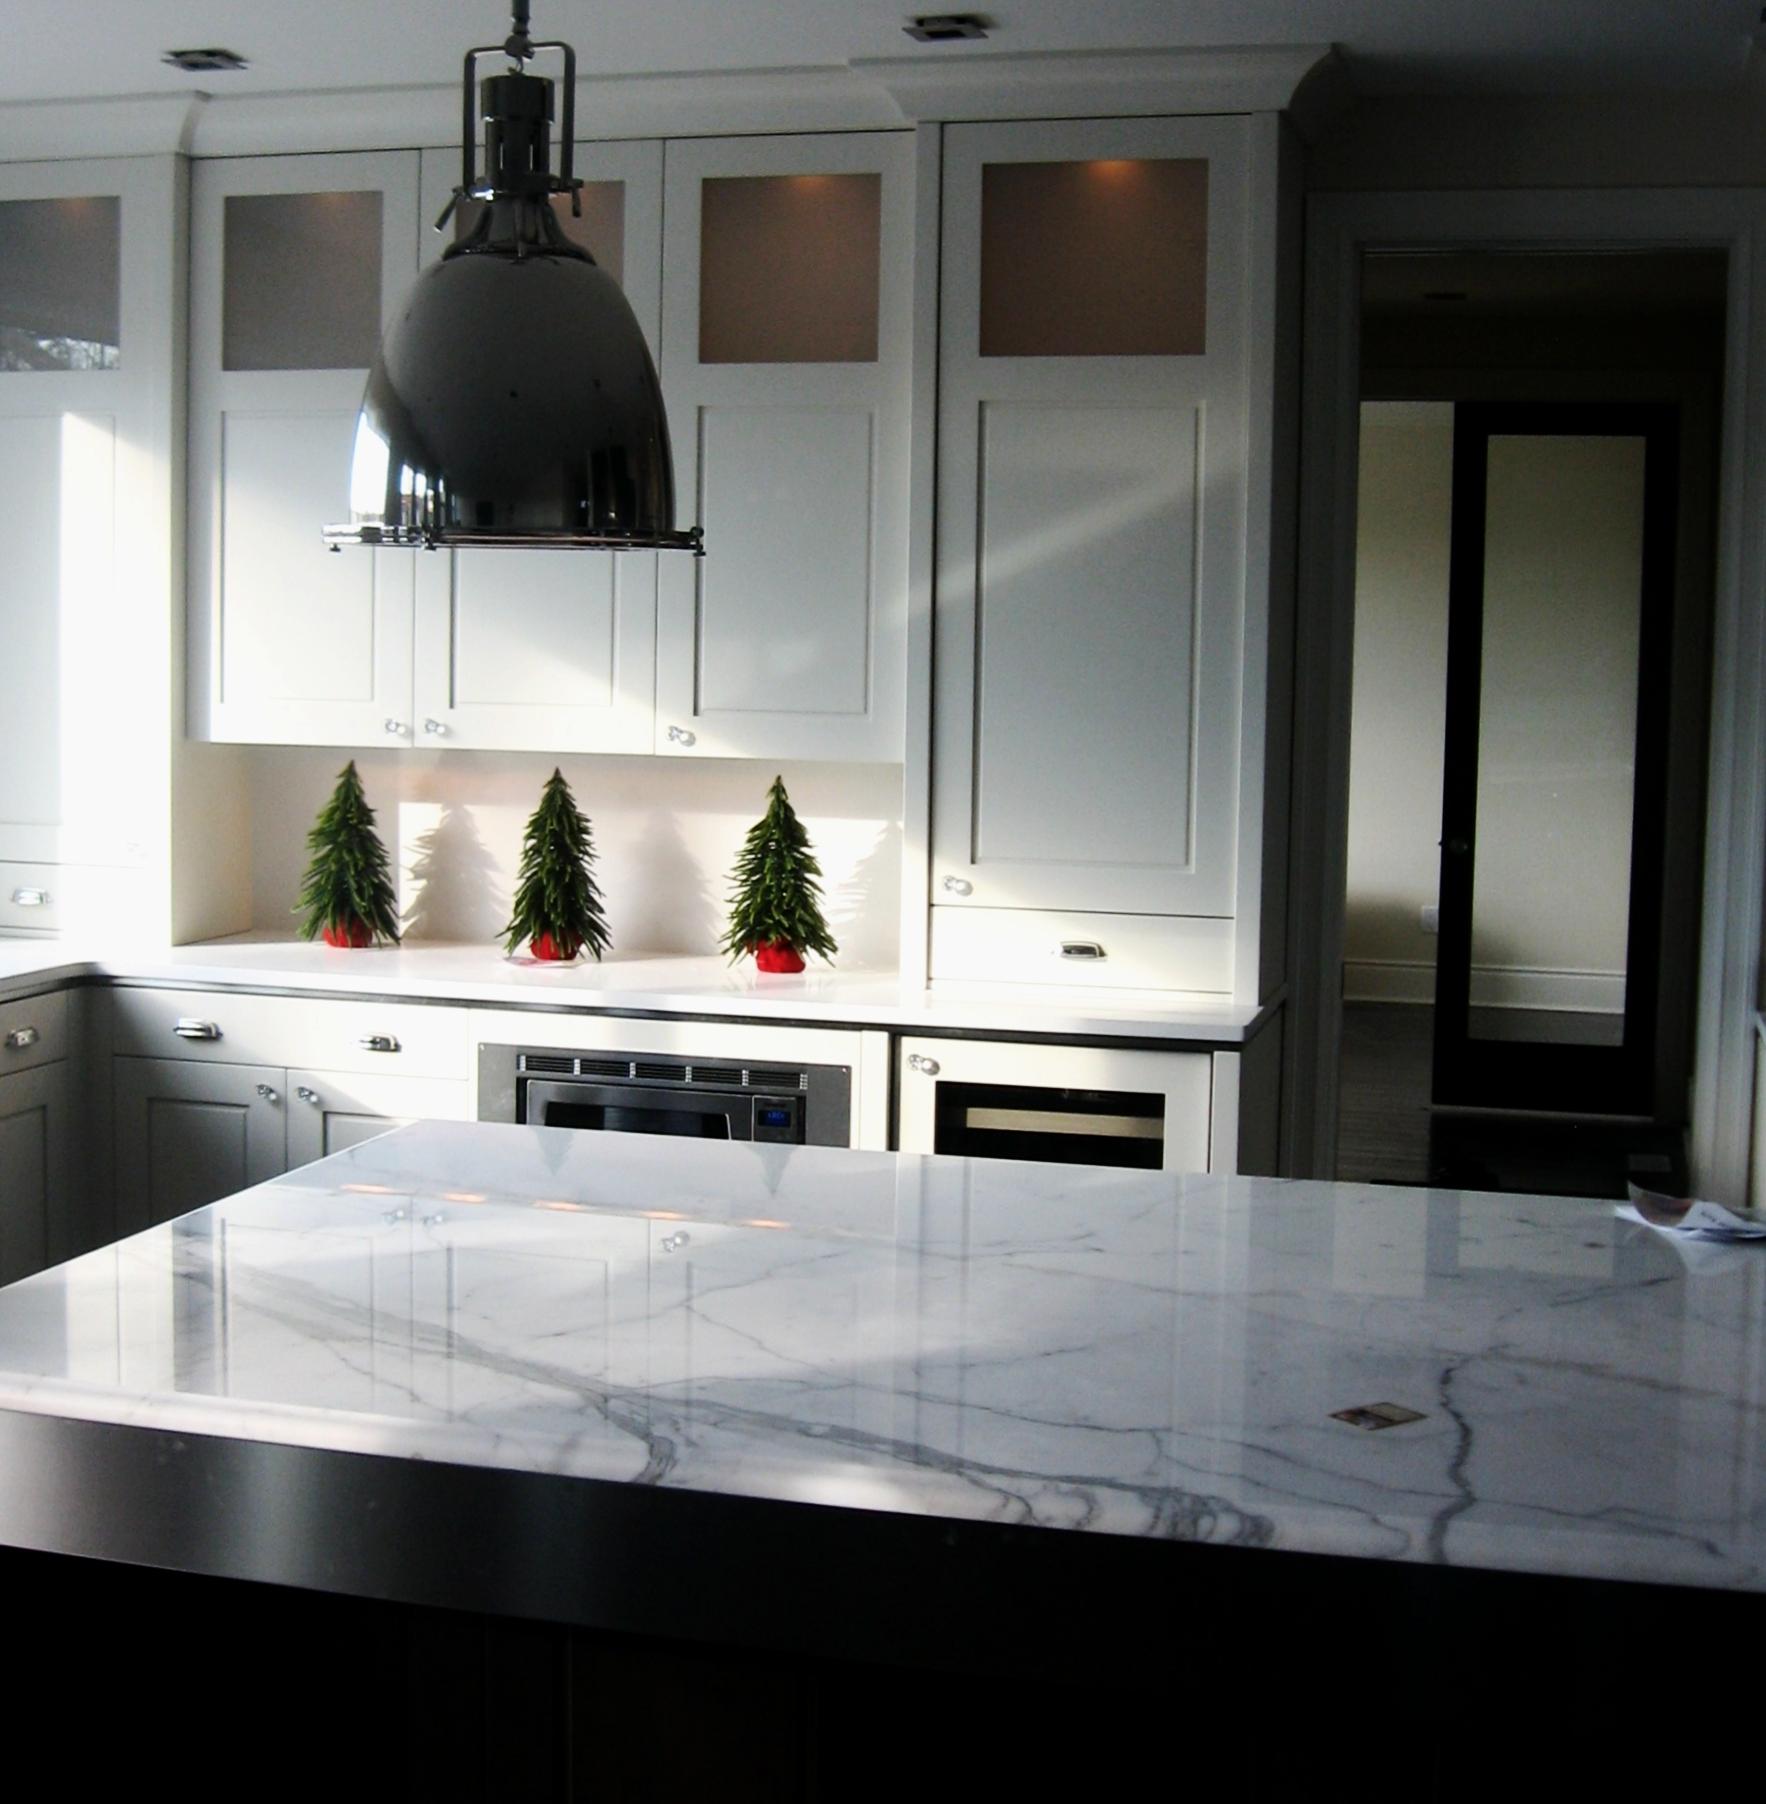 Kitchen Marble carrara countertop modern kitchen ideas inspiration.jpg